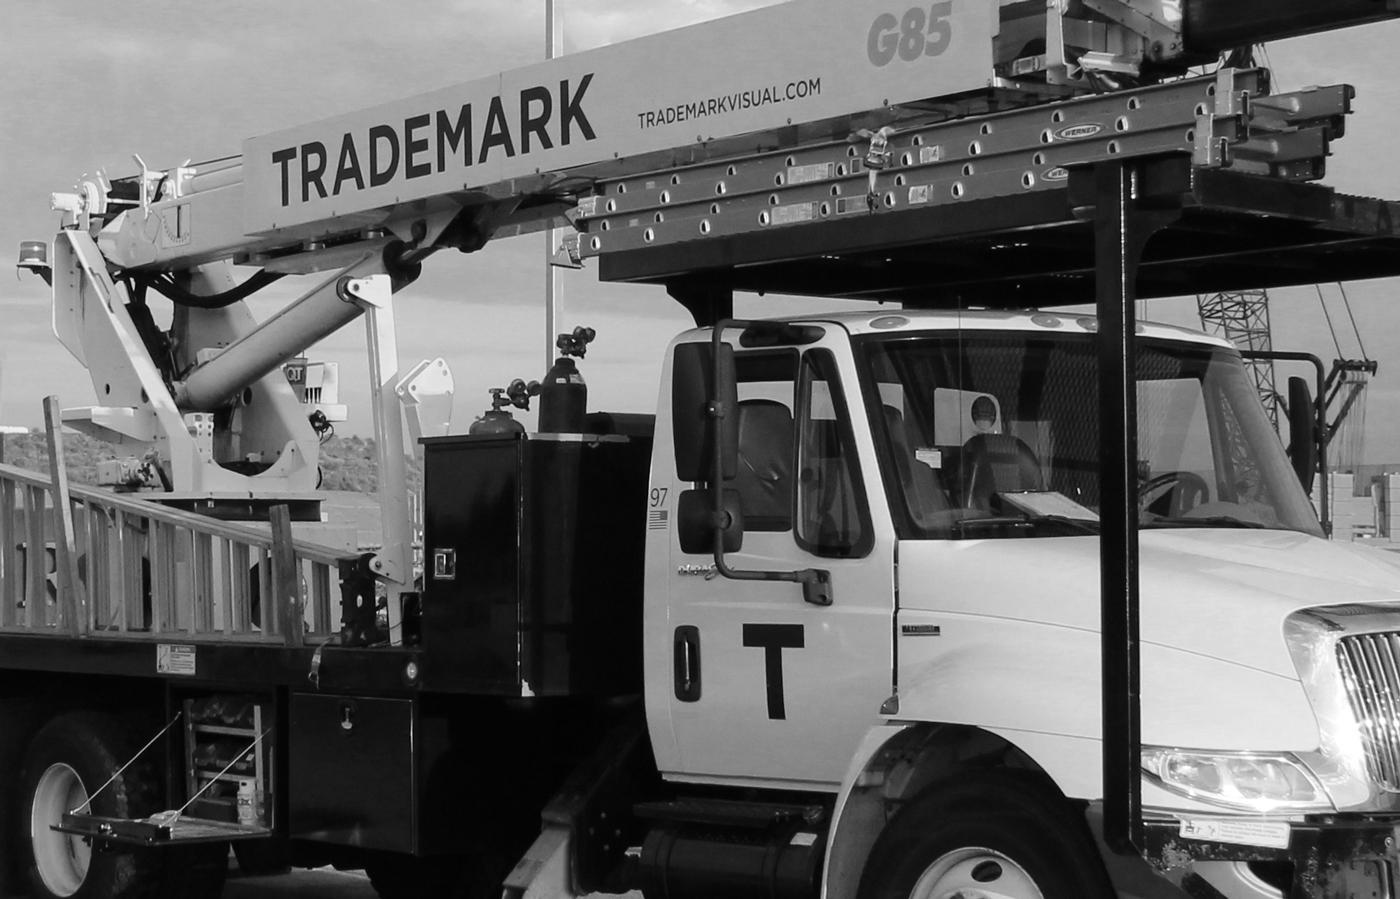 Trademark Service